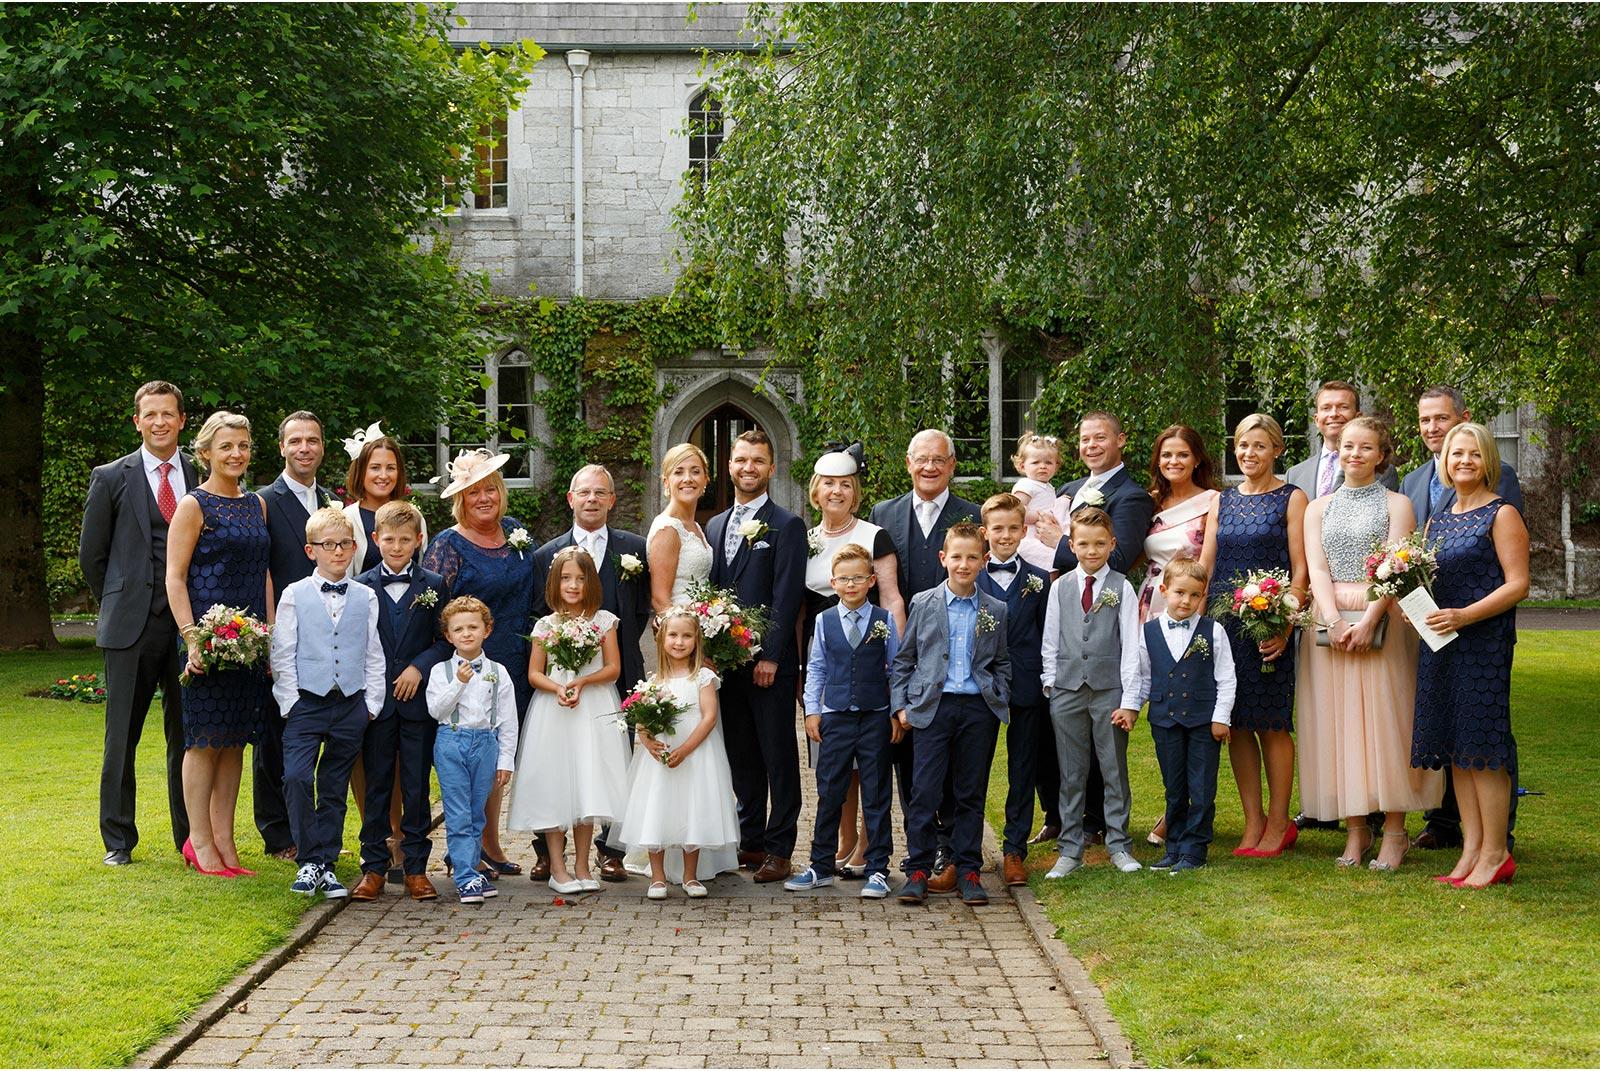 UCC wedding, presidents gardens family photograph